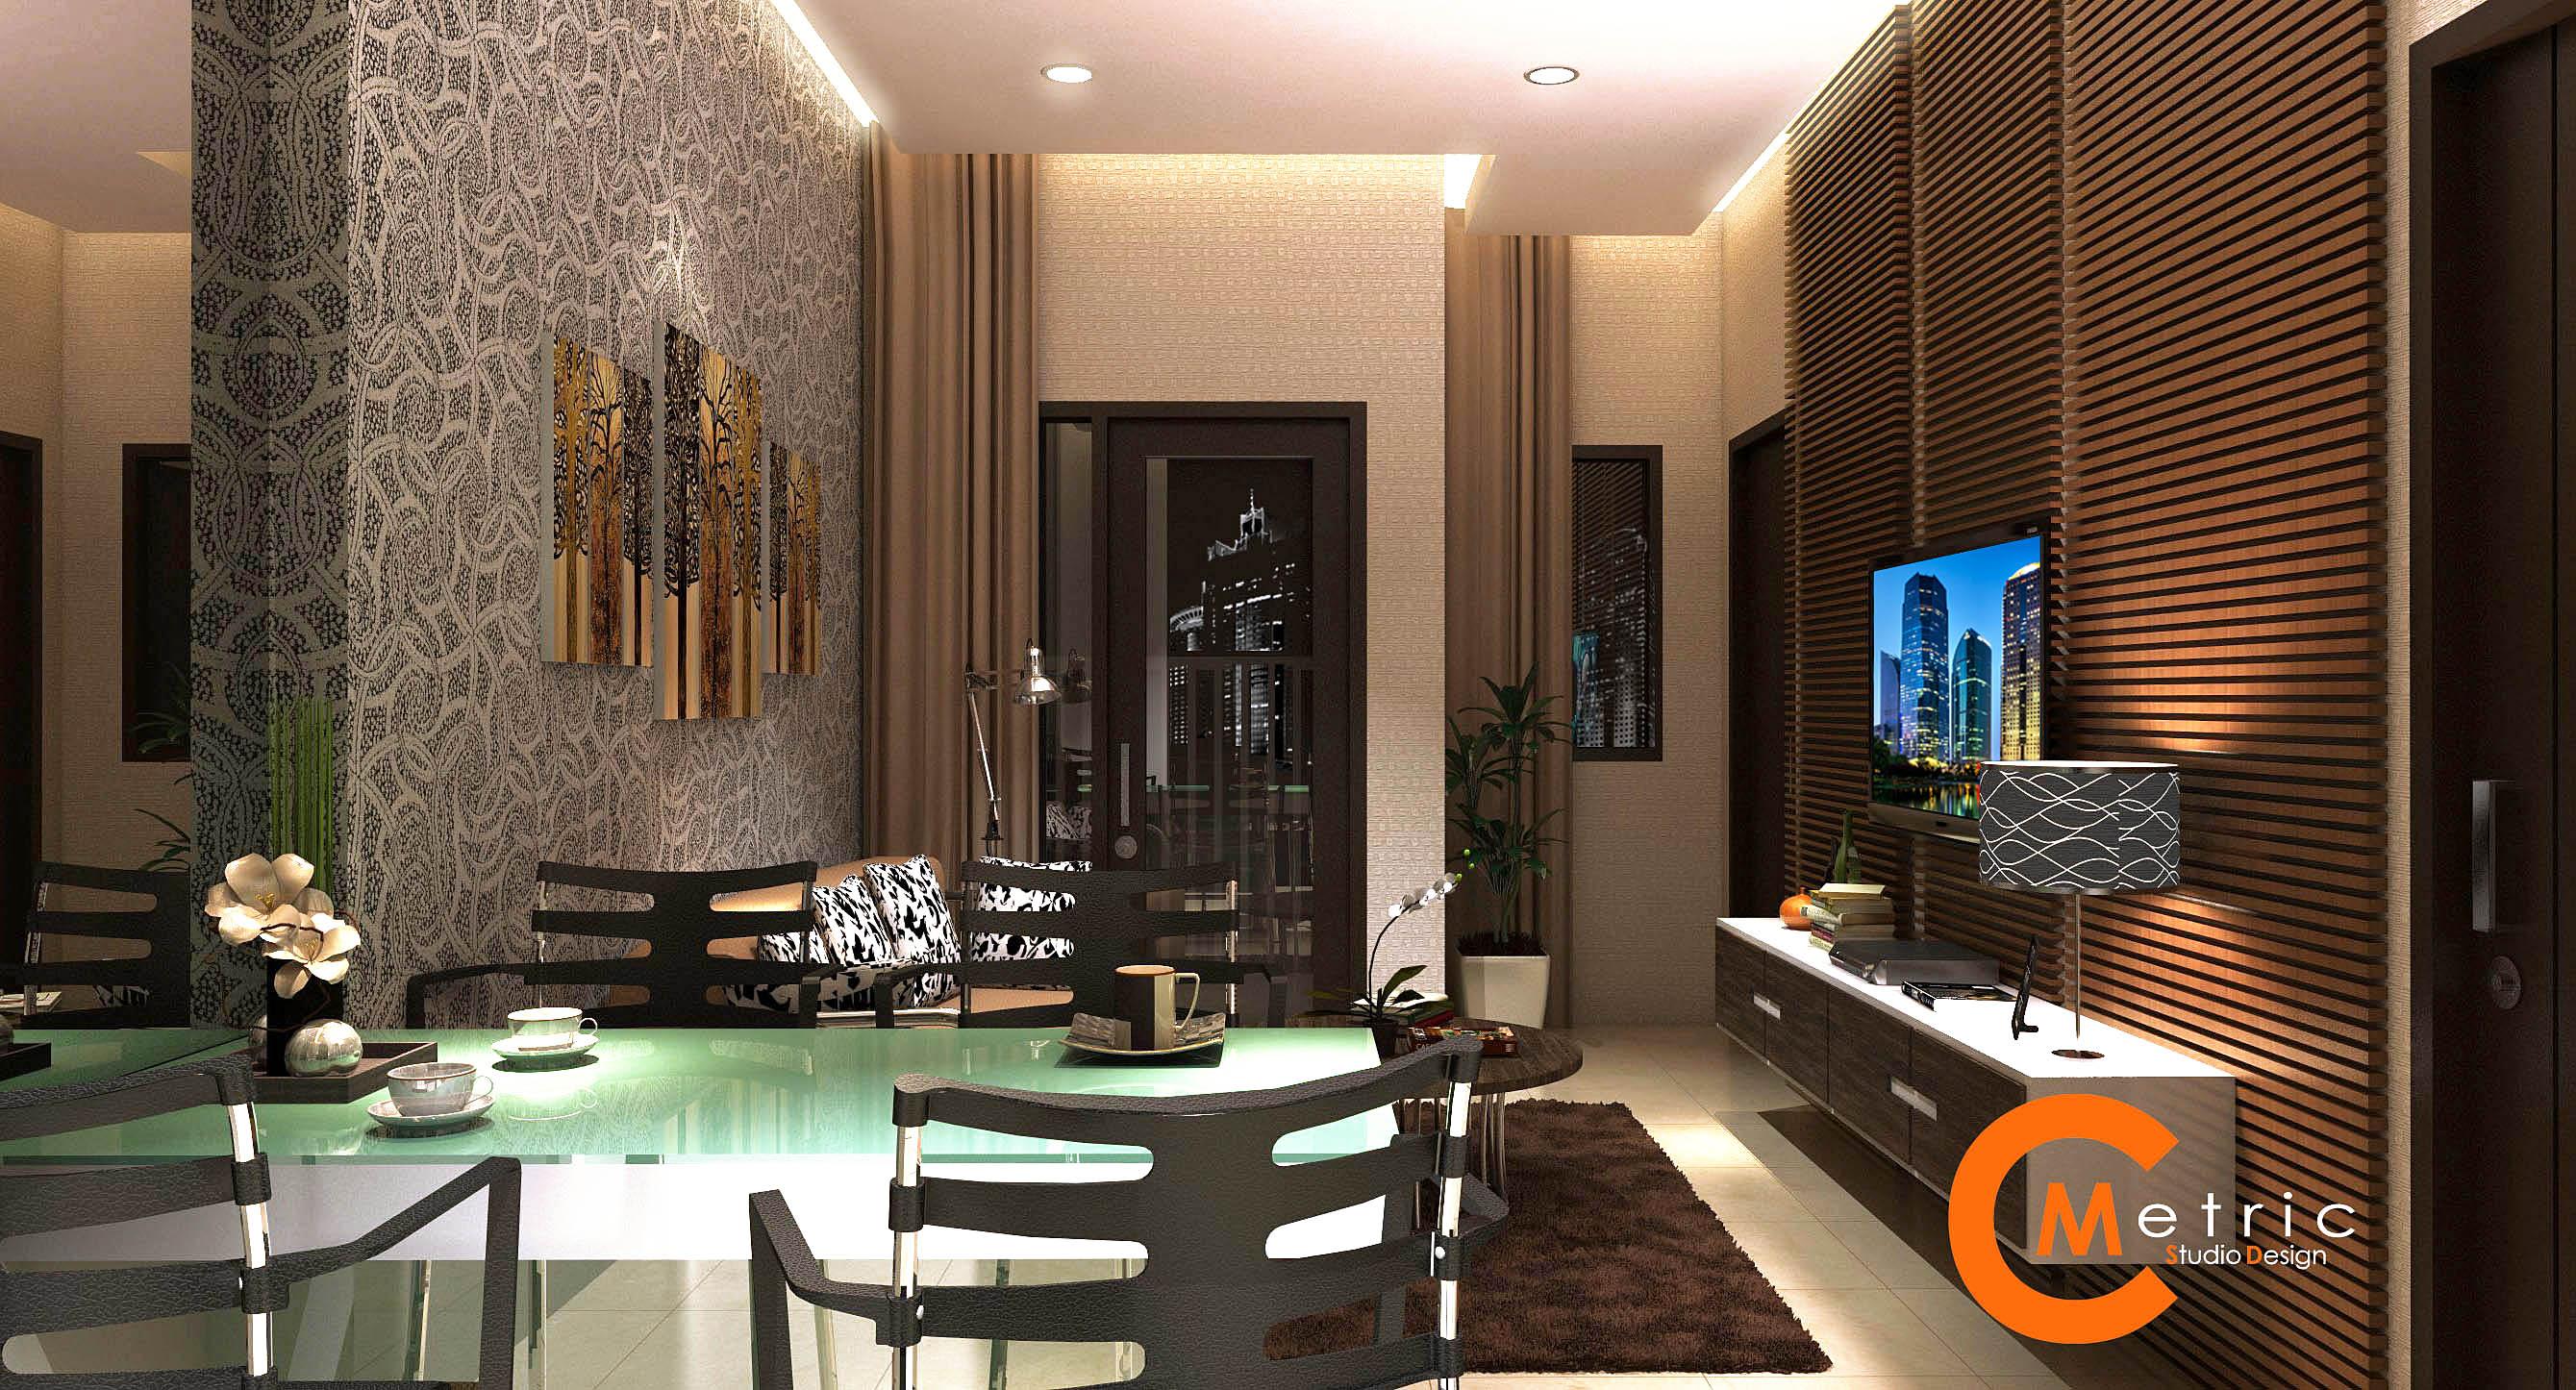 jasa desain 3d animasi interior arsitektur model 3d presentasi render apartemen